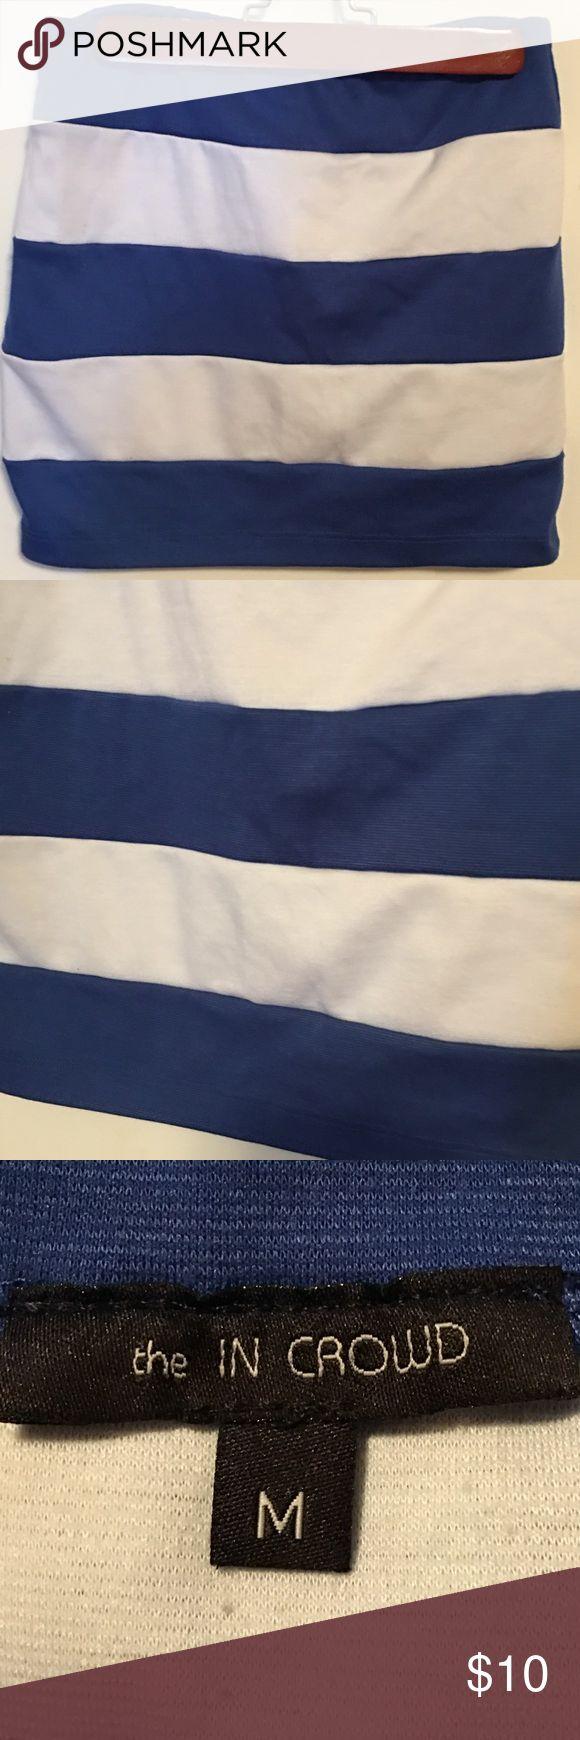 Royal blue and White striped Mini Skirt Royal blue and white striped mini skirt. Size medium. Excellent condition. Skirts Mini